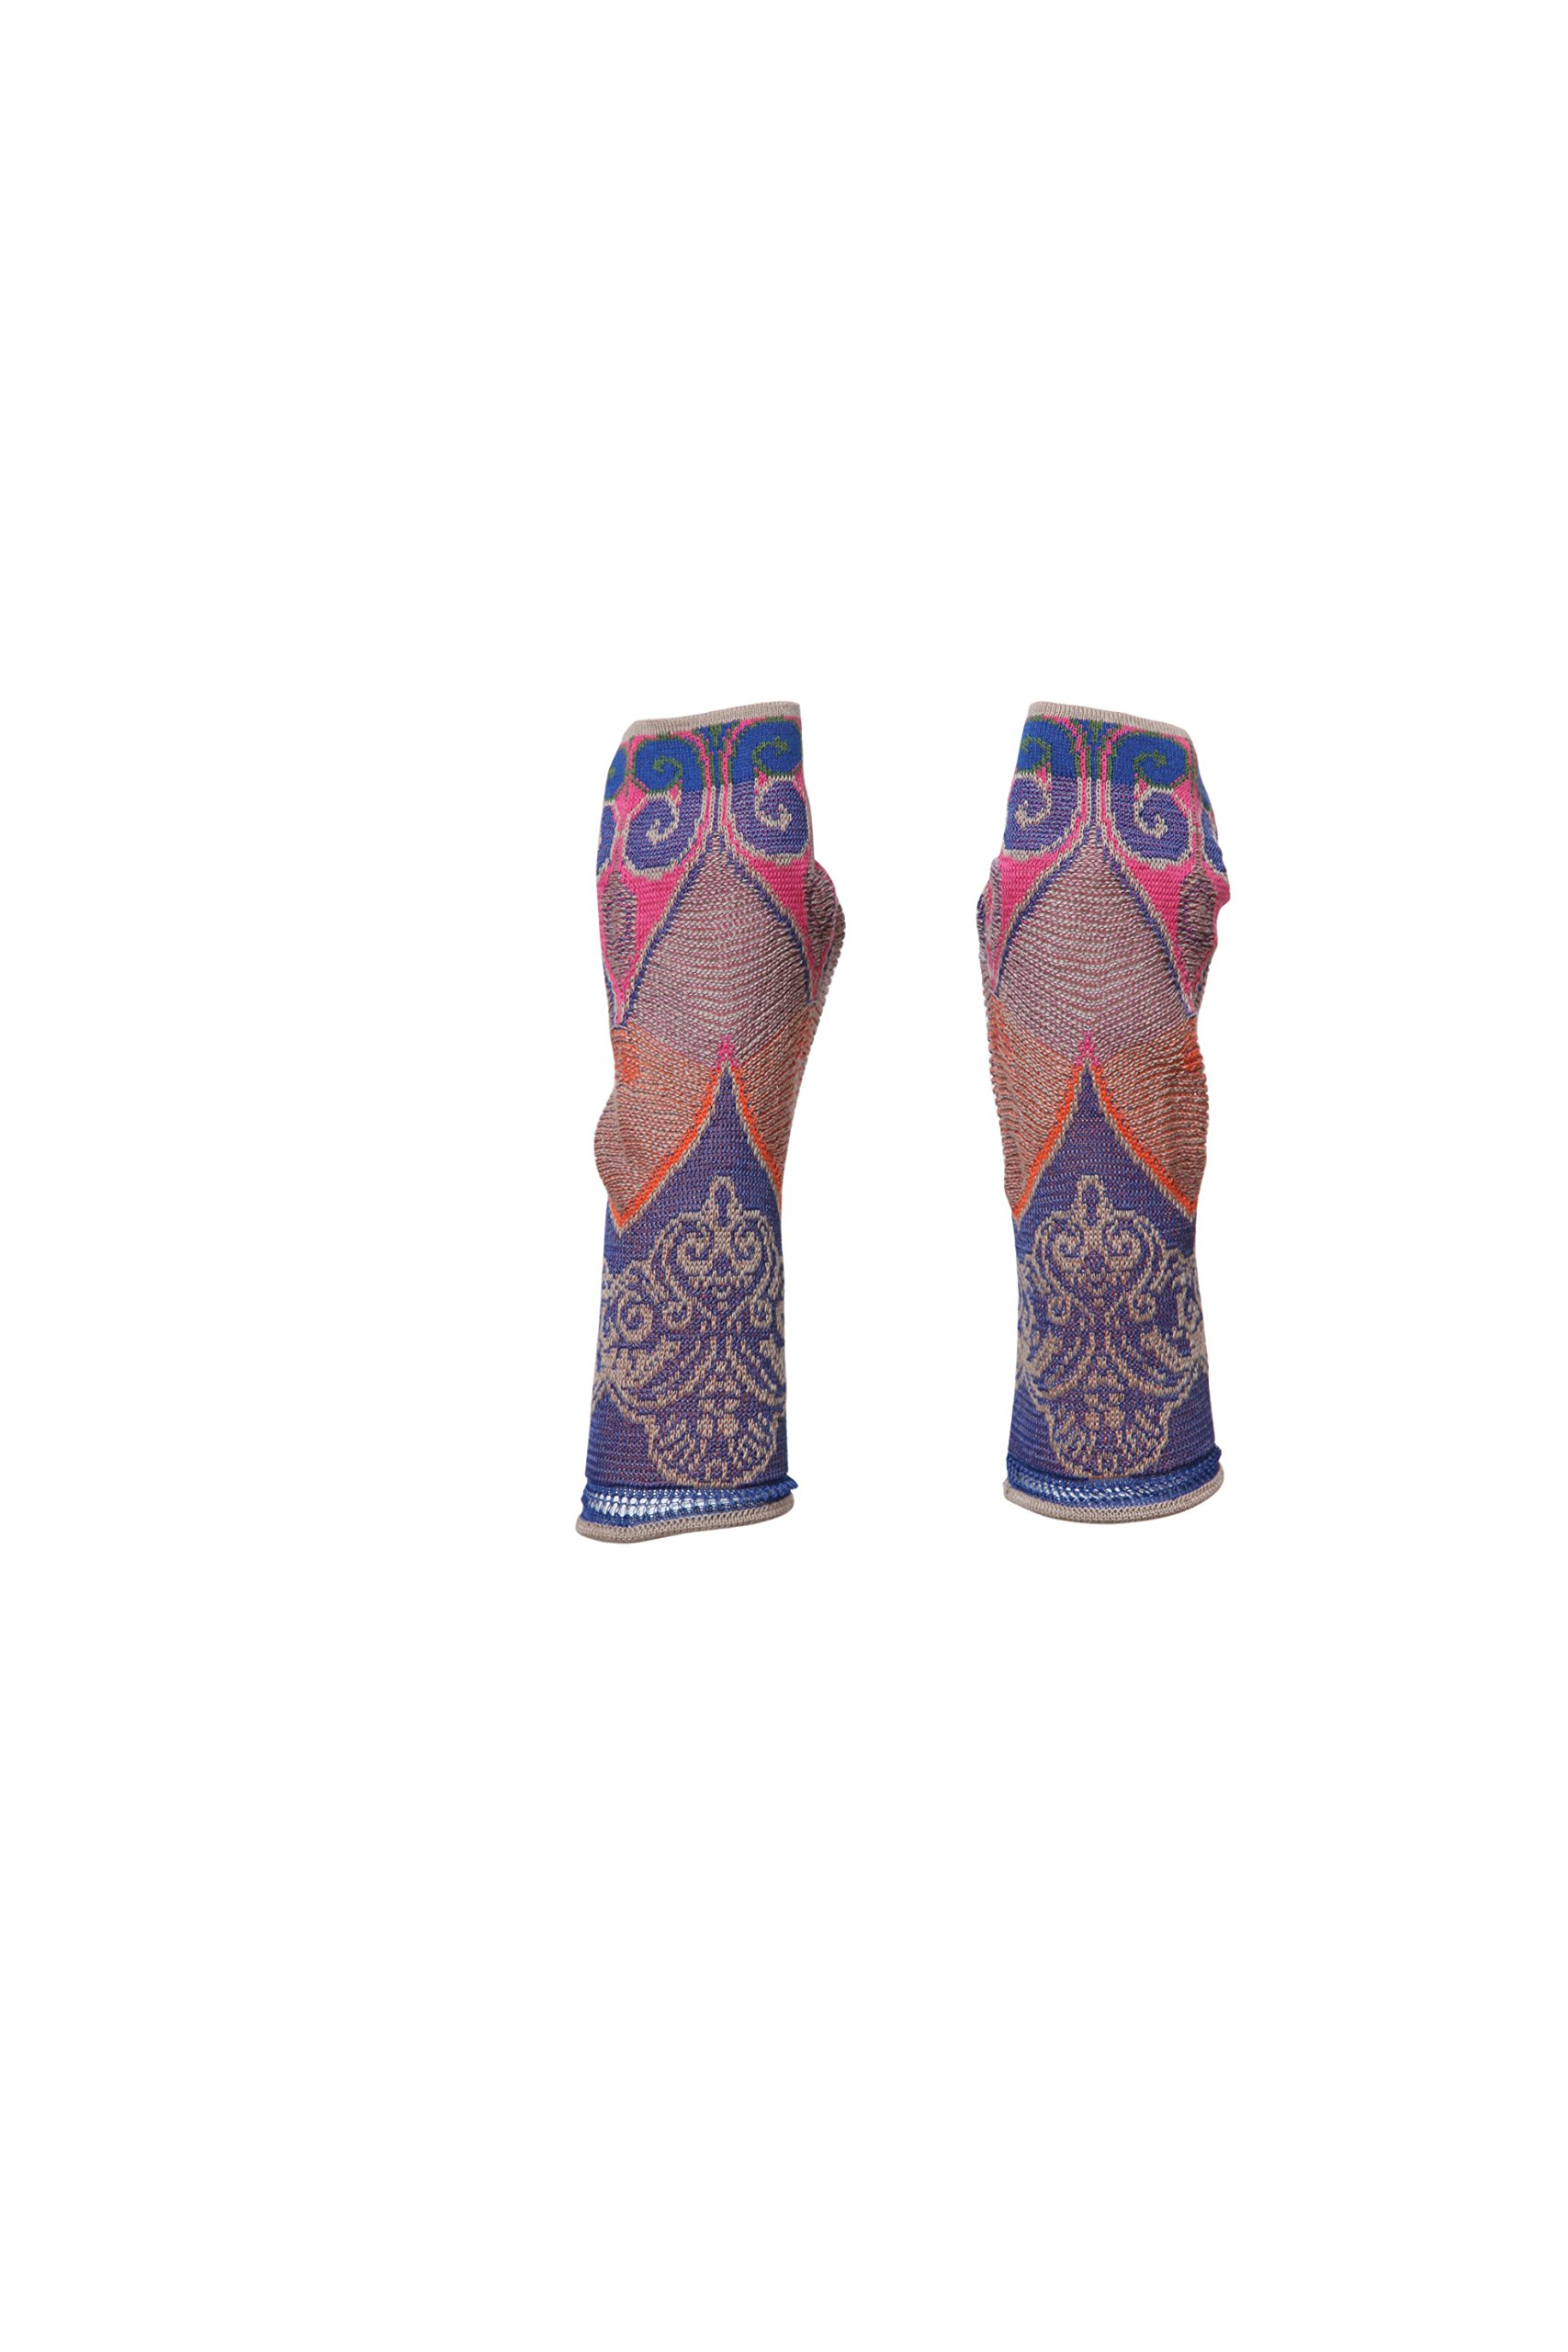 IVKO Loose Stitch, Spring Fingerless Gloves, China Blue